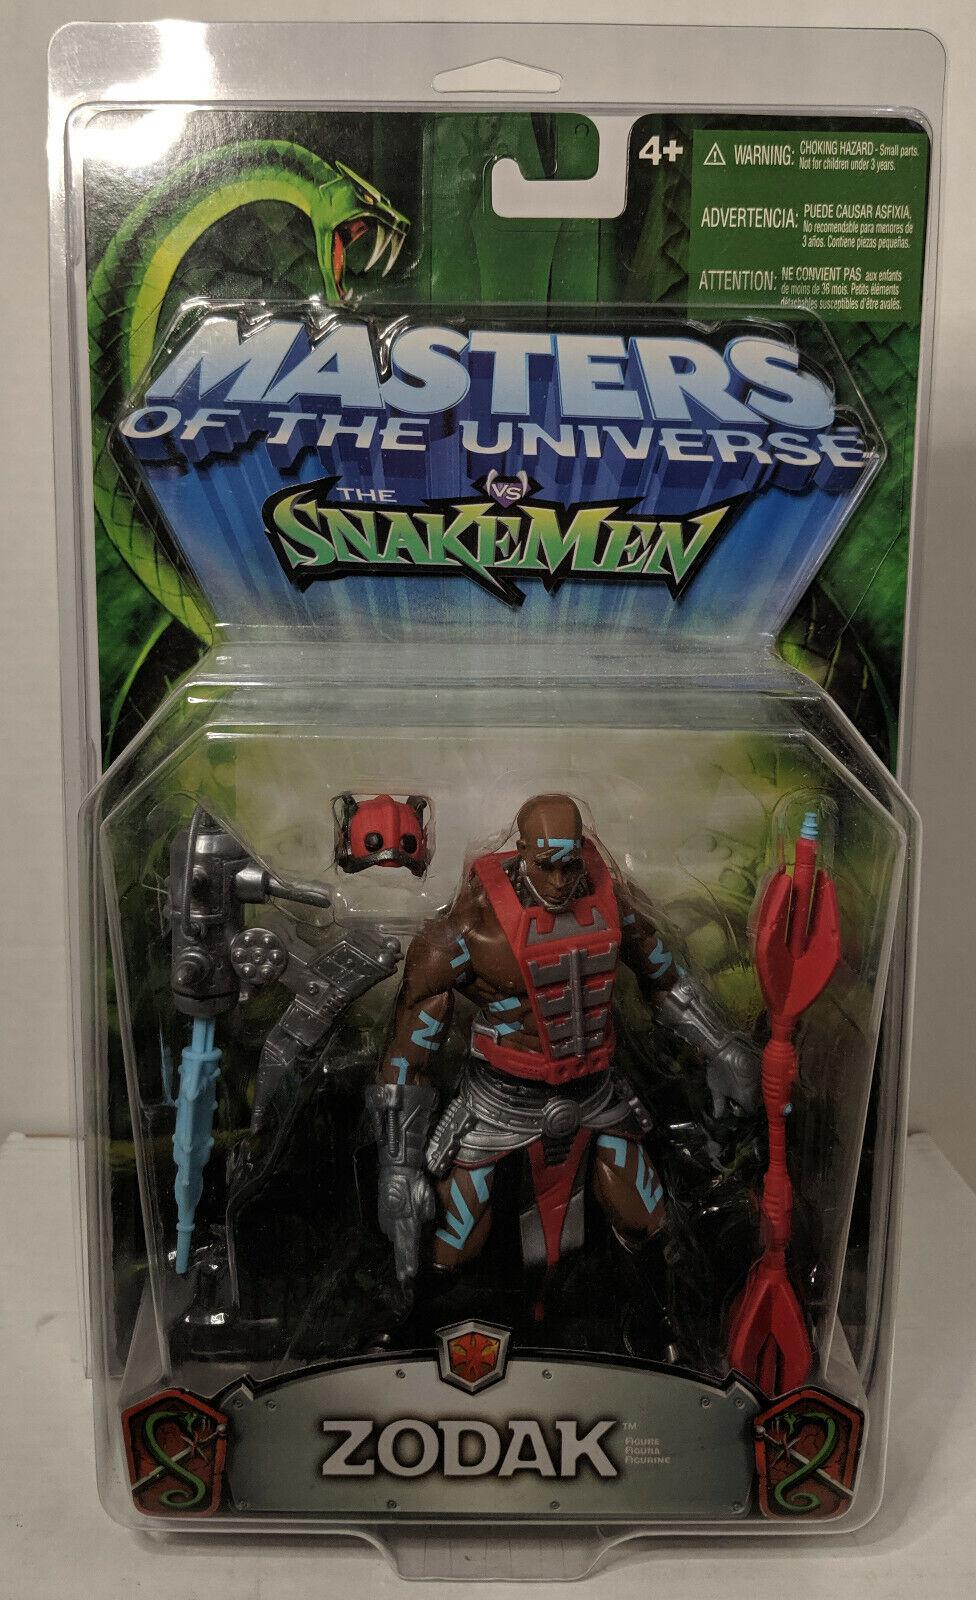 Masters del Universo 200X Amos del Universo vs el Snakemen Zodak Figura Mattel 2003